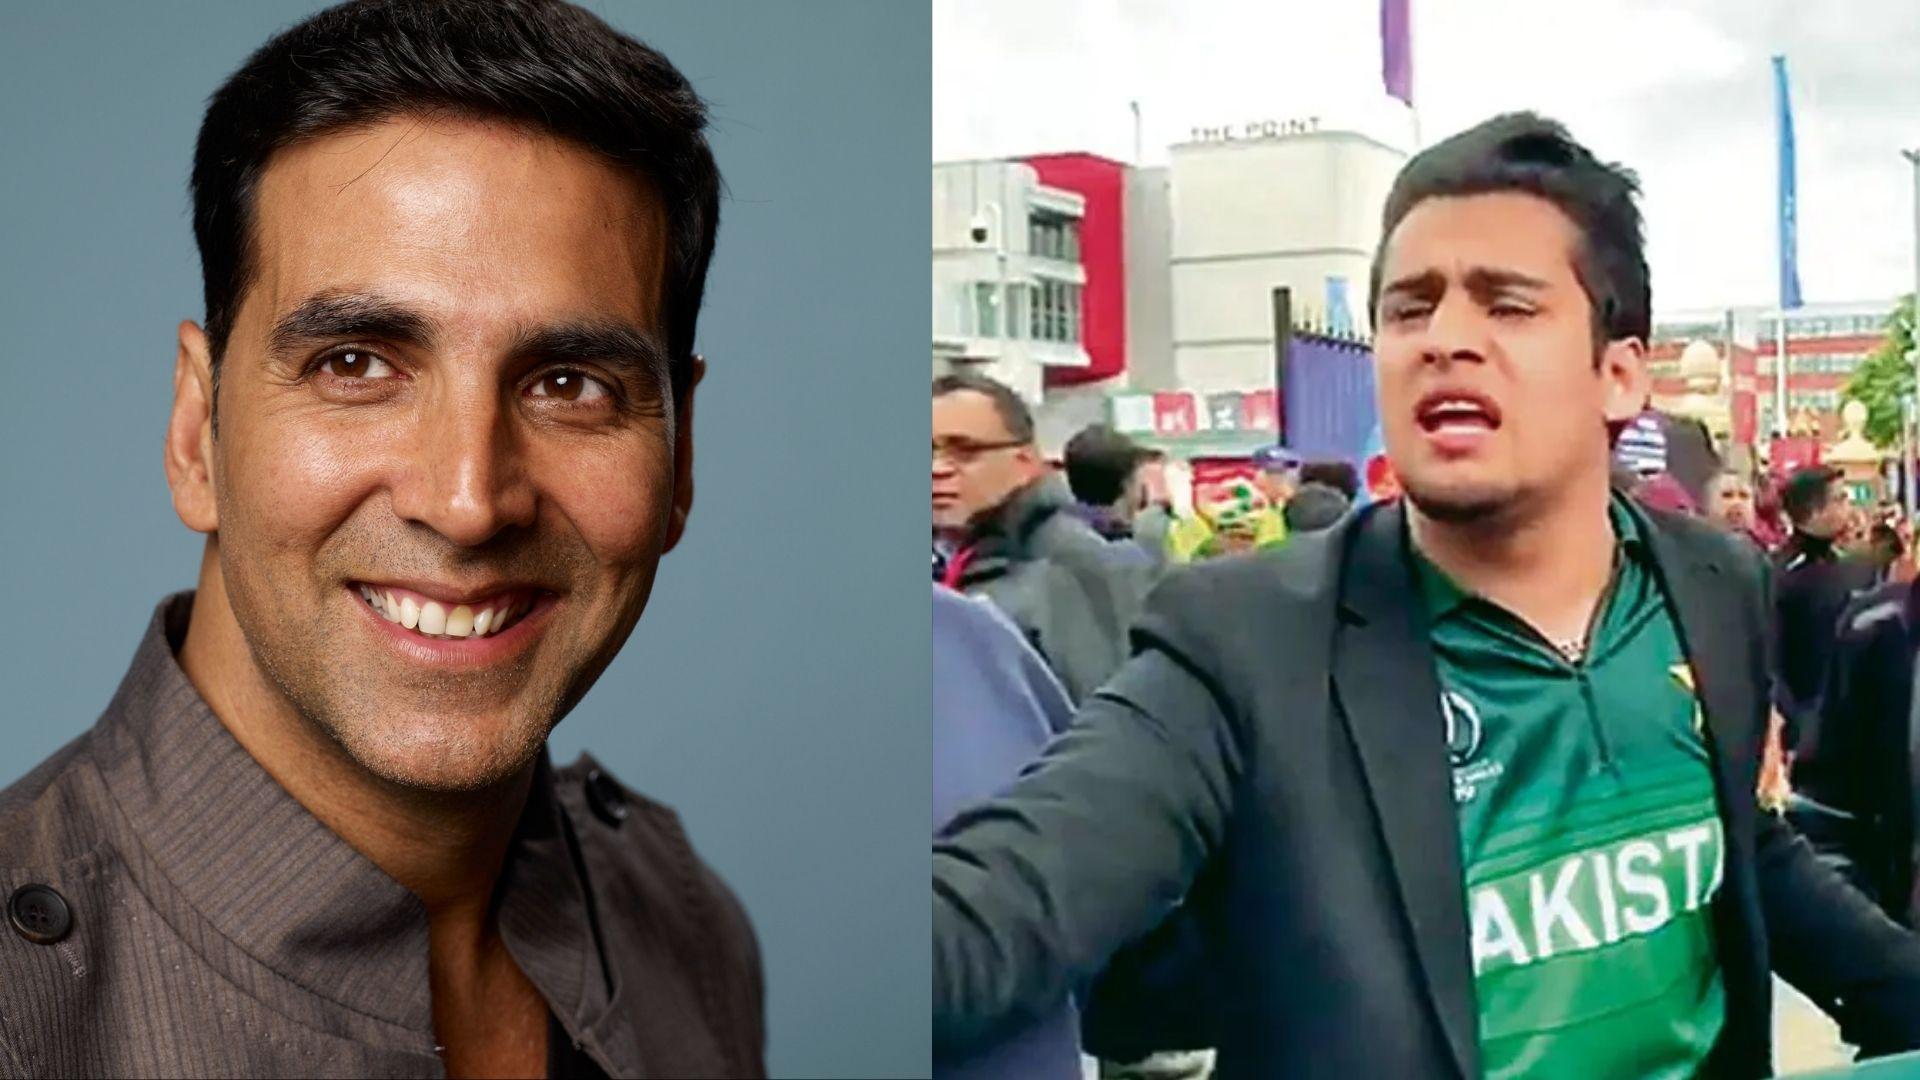 India Vs Pakistan T20 Match: Akshay Kumar Gets Snapped Jabbing With The Pakistani Meme Boy